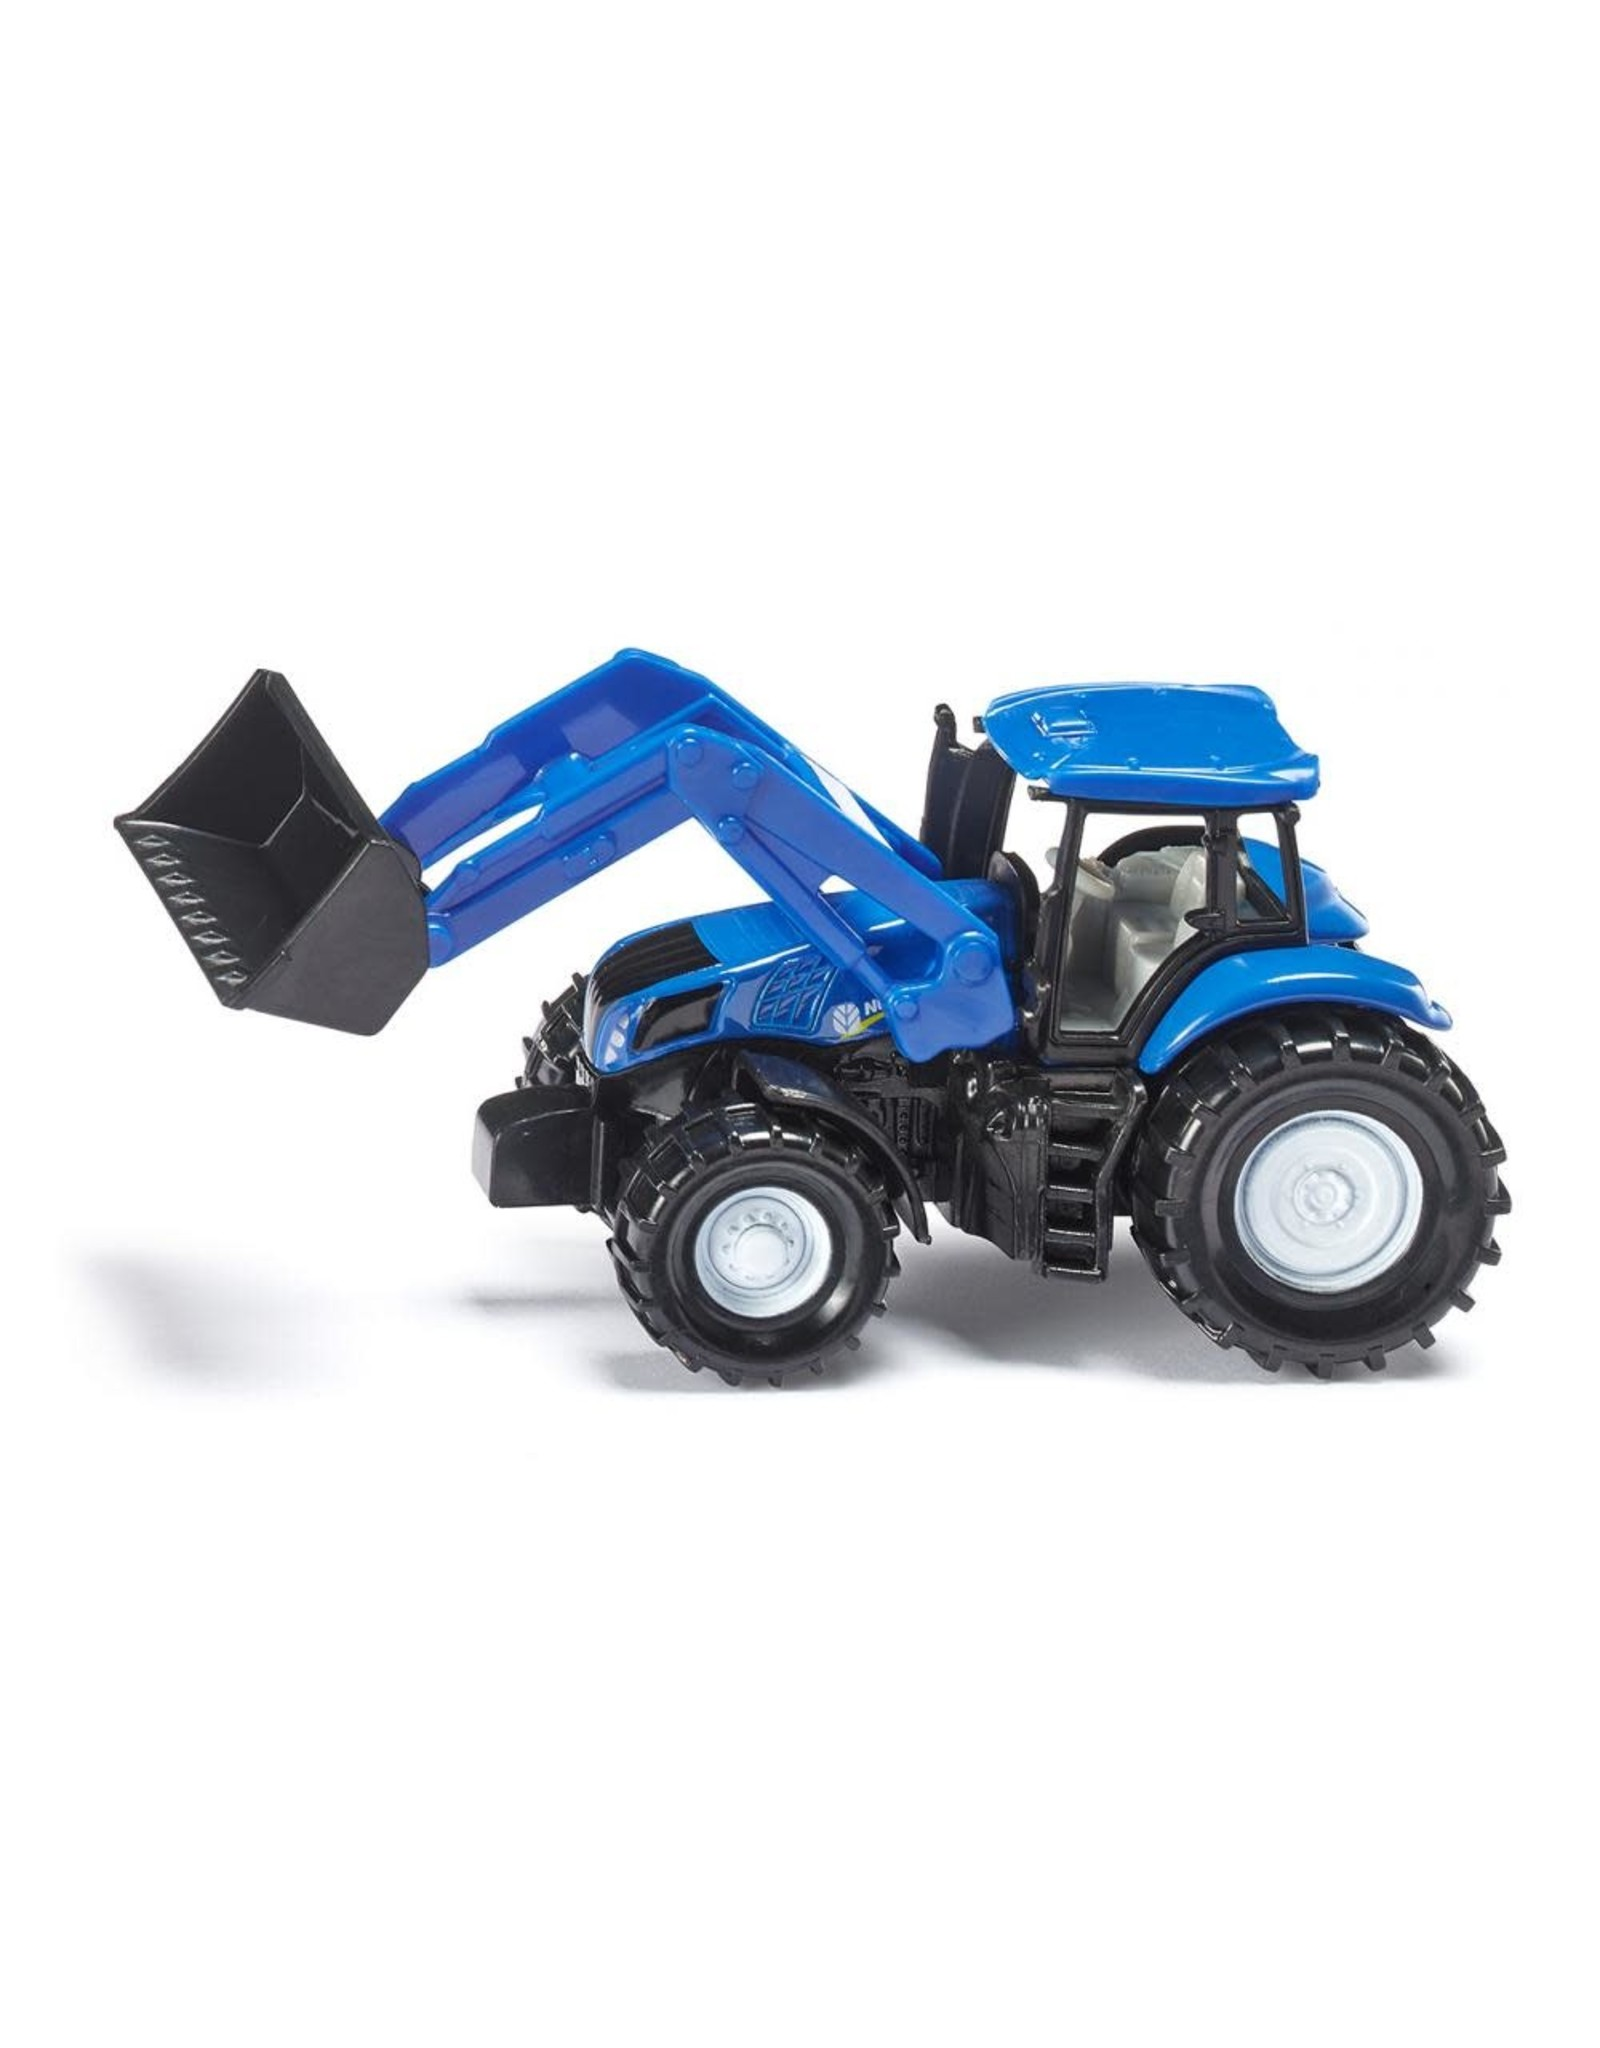 Siku Siku New Holland Front Loader Tractor